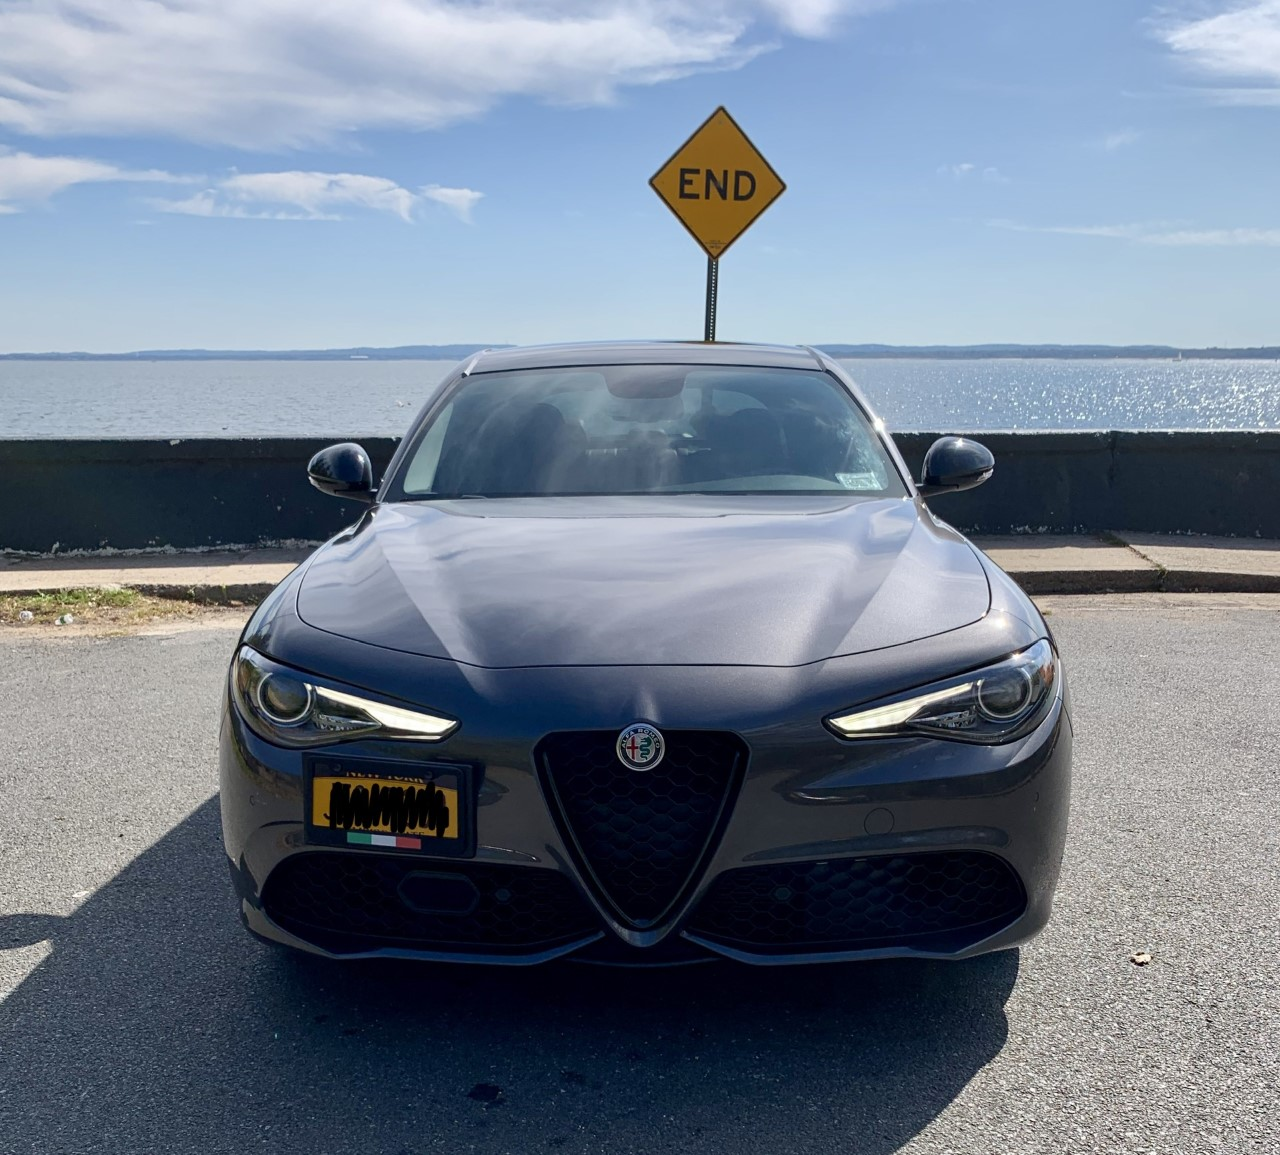 2018 Alfa Romeo Giulia Ti Sport AWD $50K MSRP $490/mo Inc